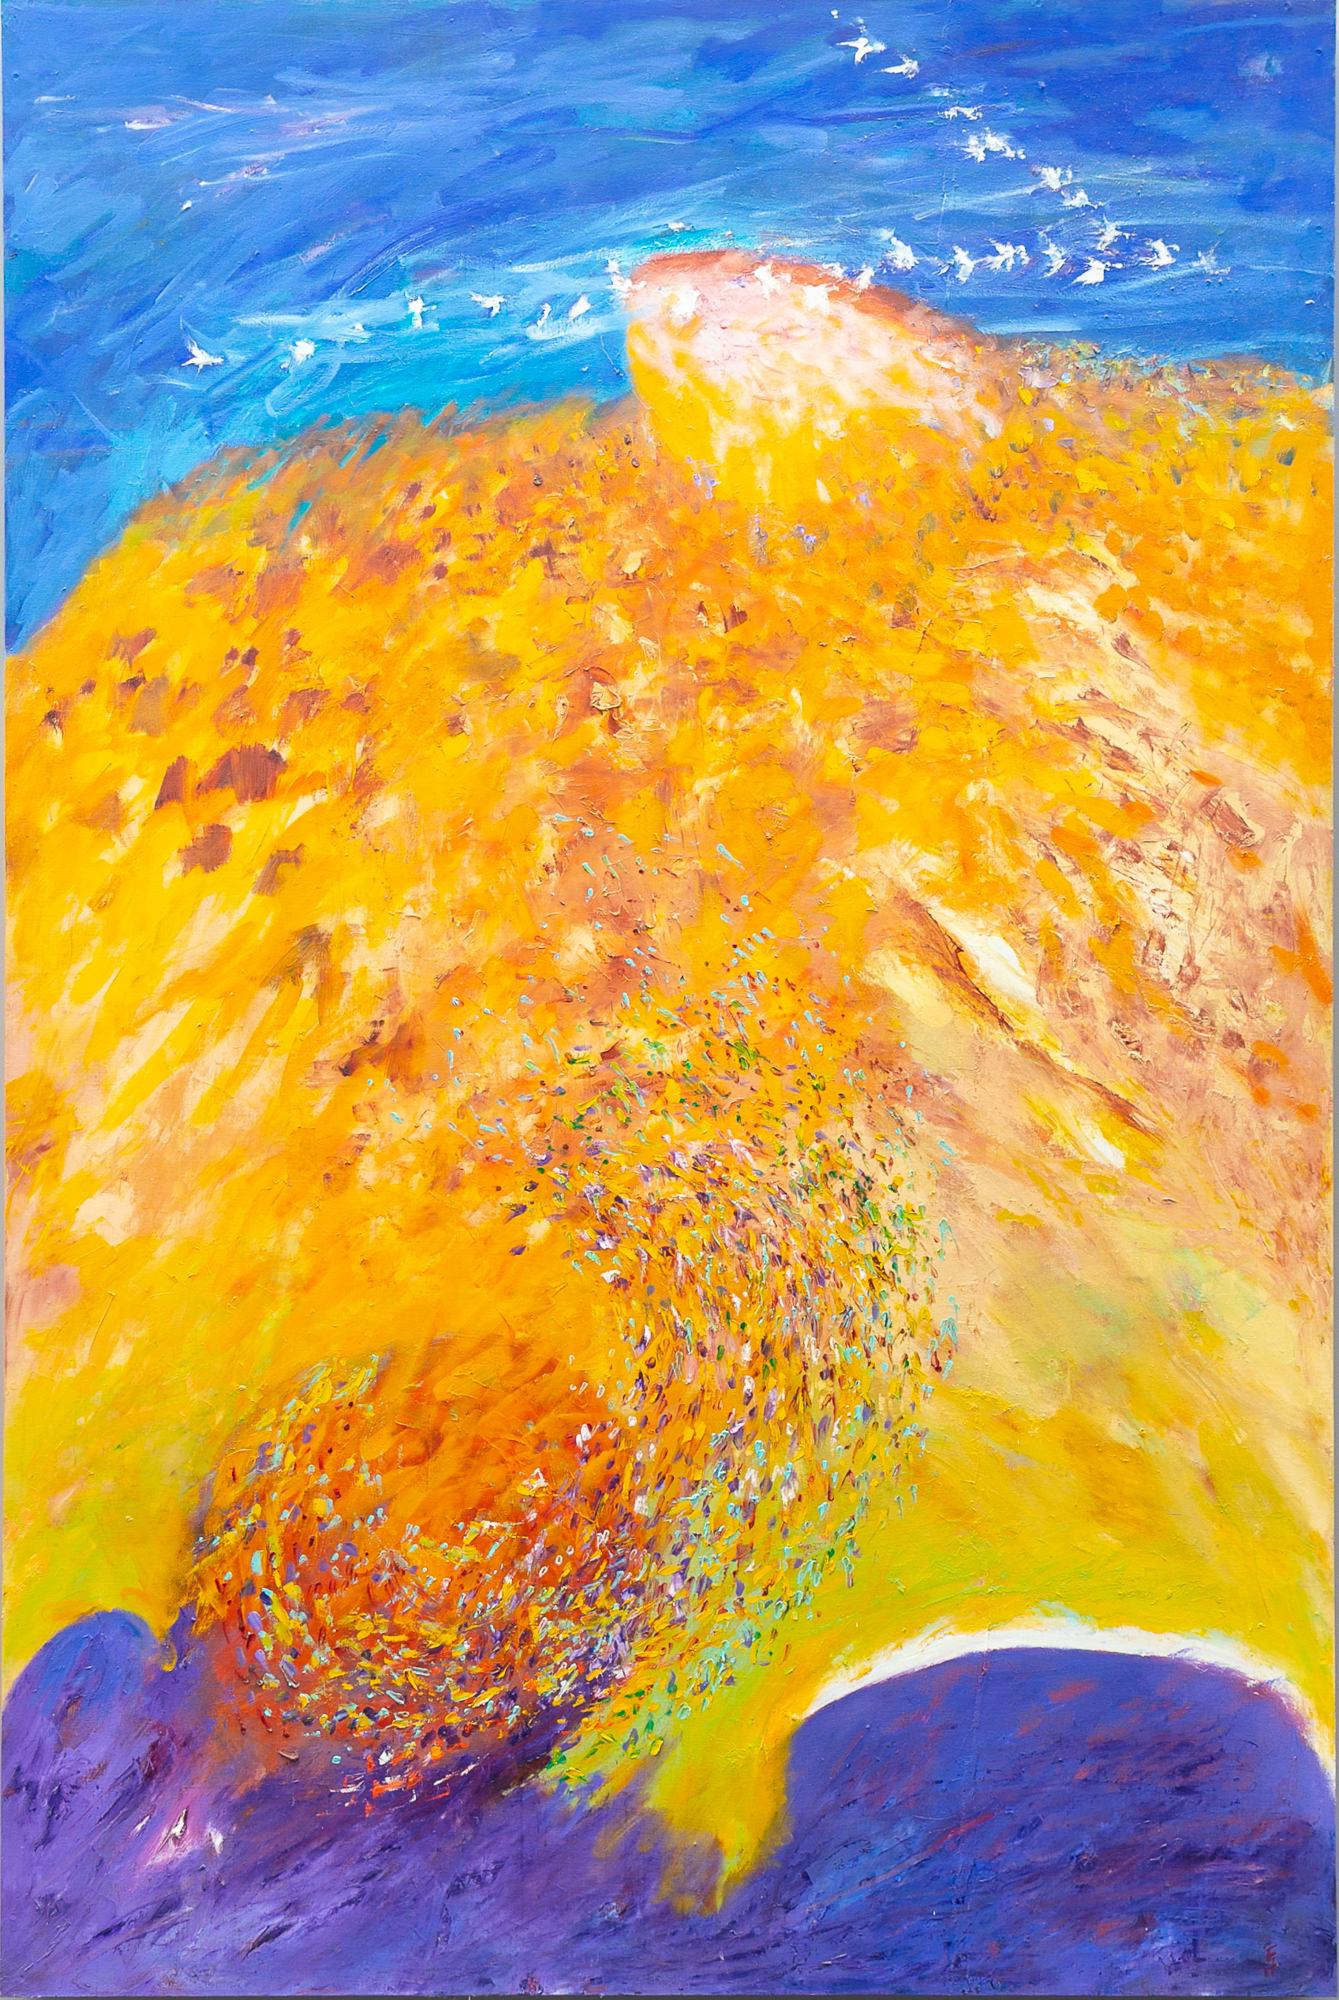 'Frank Hodgkinson (1919-2001) Four Seasons - Autumn 1993, Oil on Linen Board '